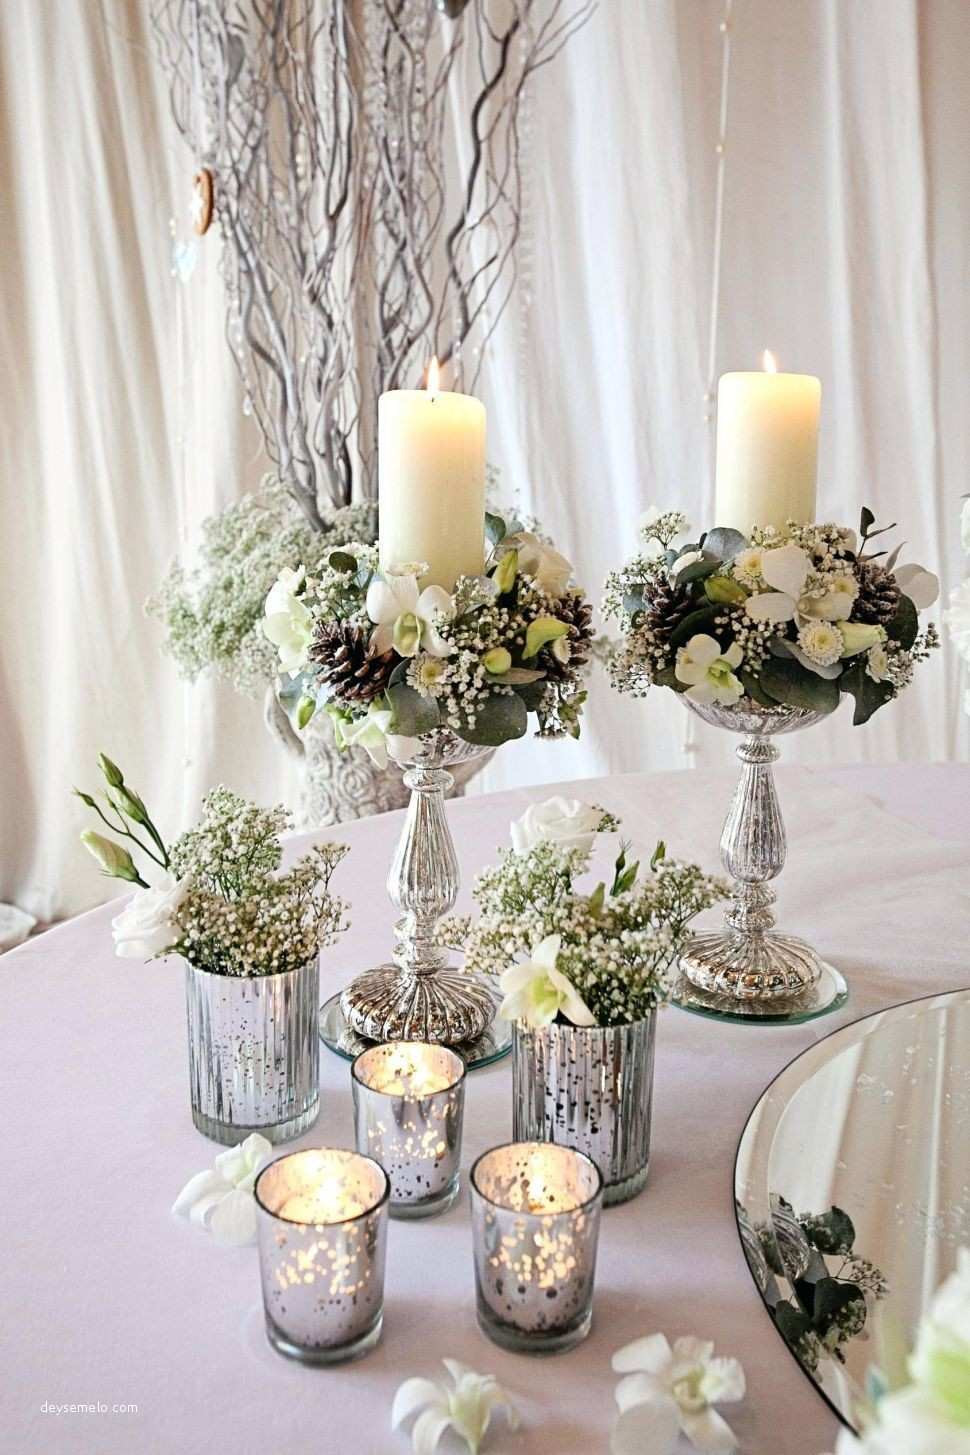 Ebay Vases for Sale Of Romantic Ebay Wedding Decorations for Sale Of Easy Wedding In Luxury Ebay Wedding Decorations for Sale with 46 Best Ebay Wedding Decorations